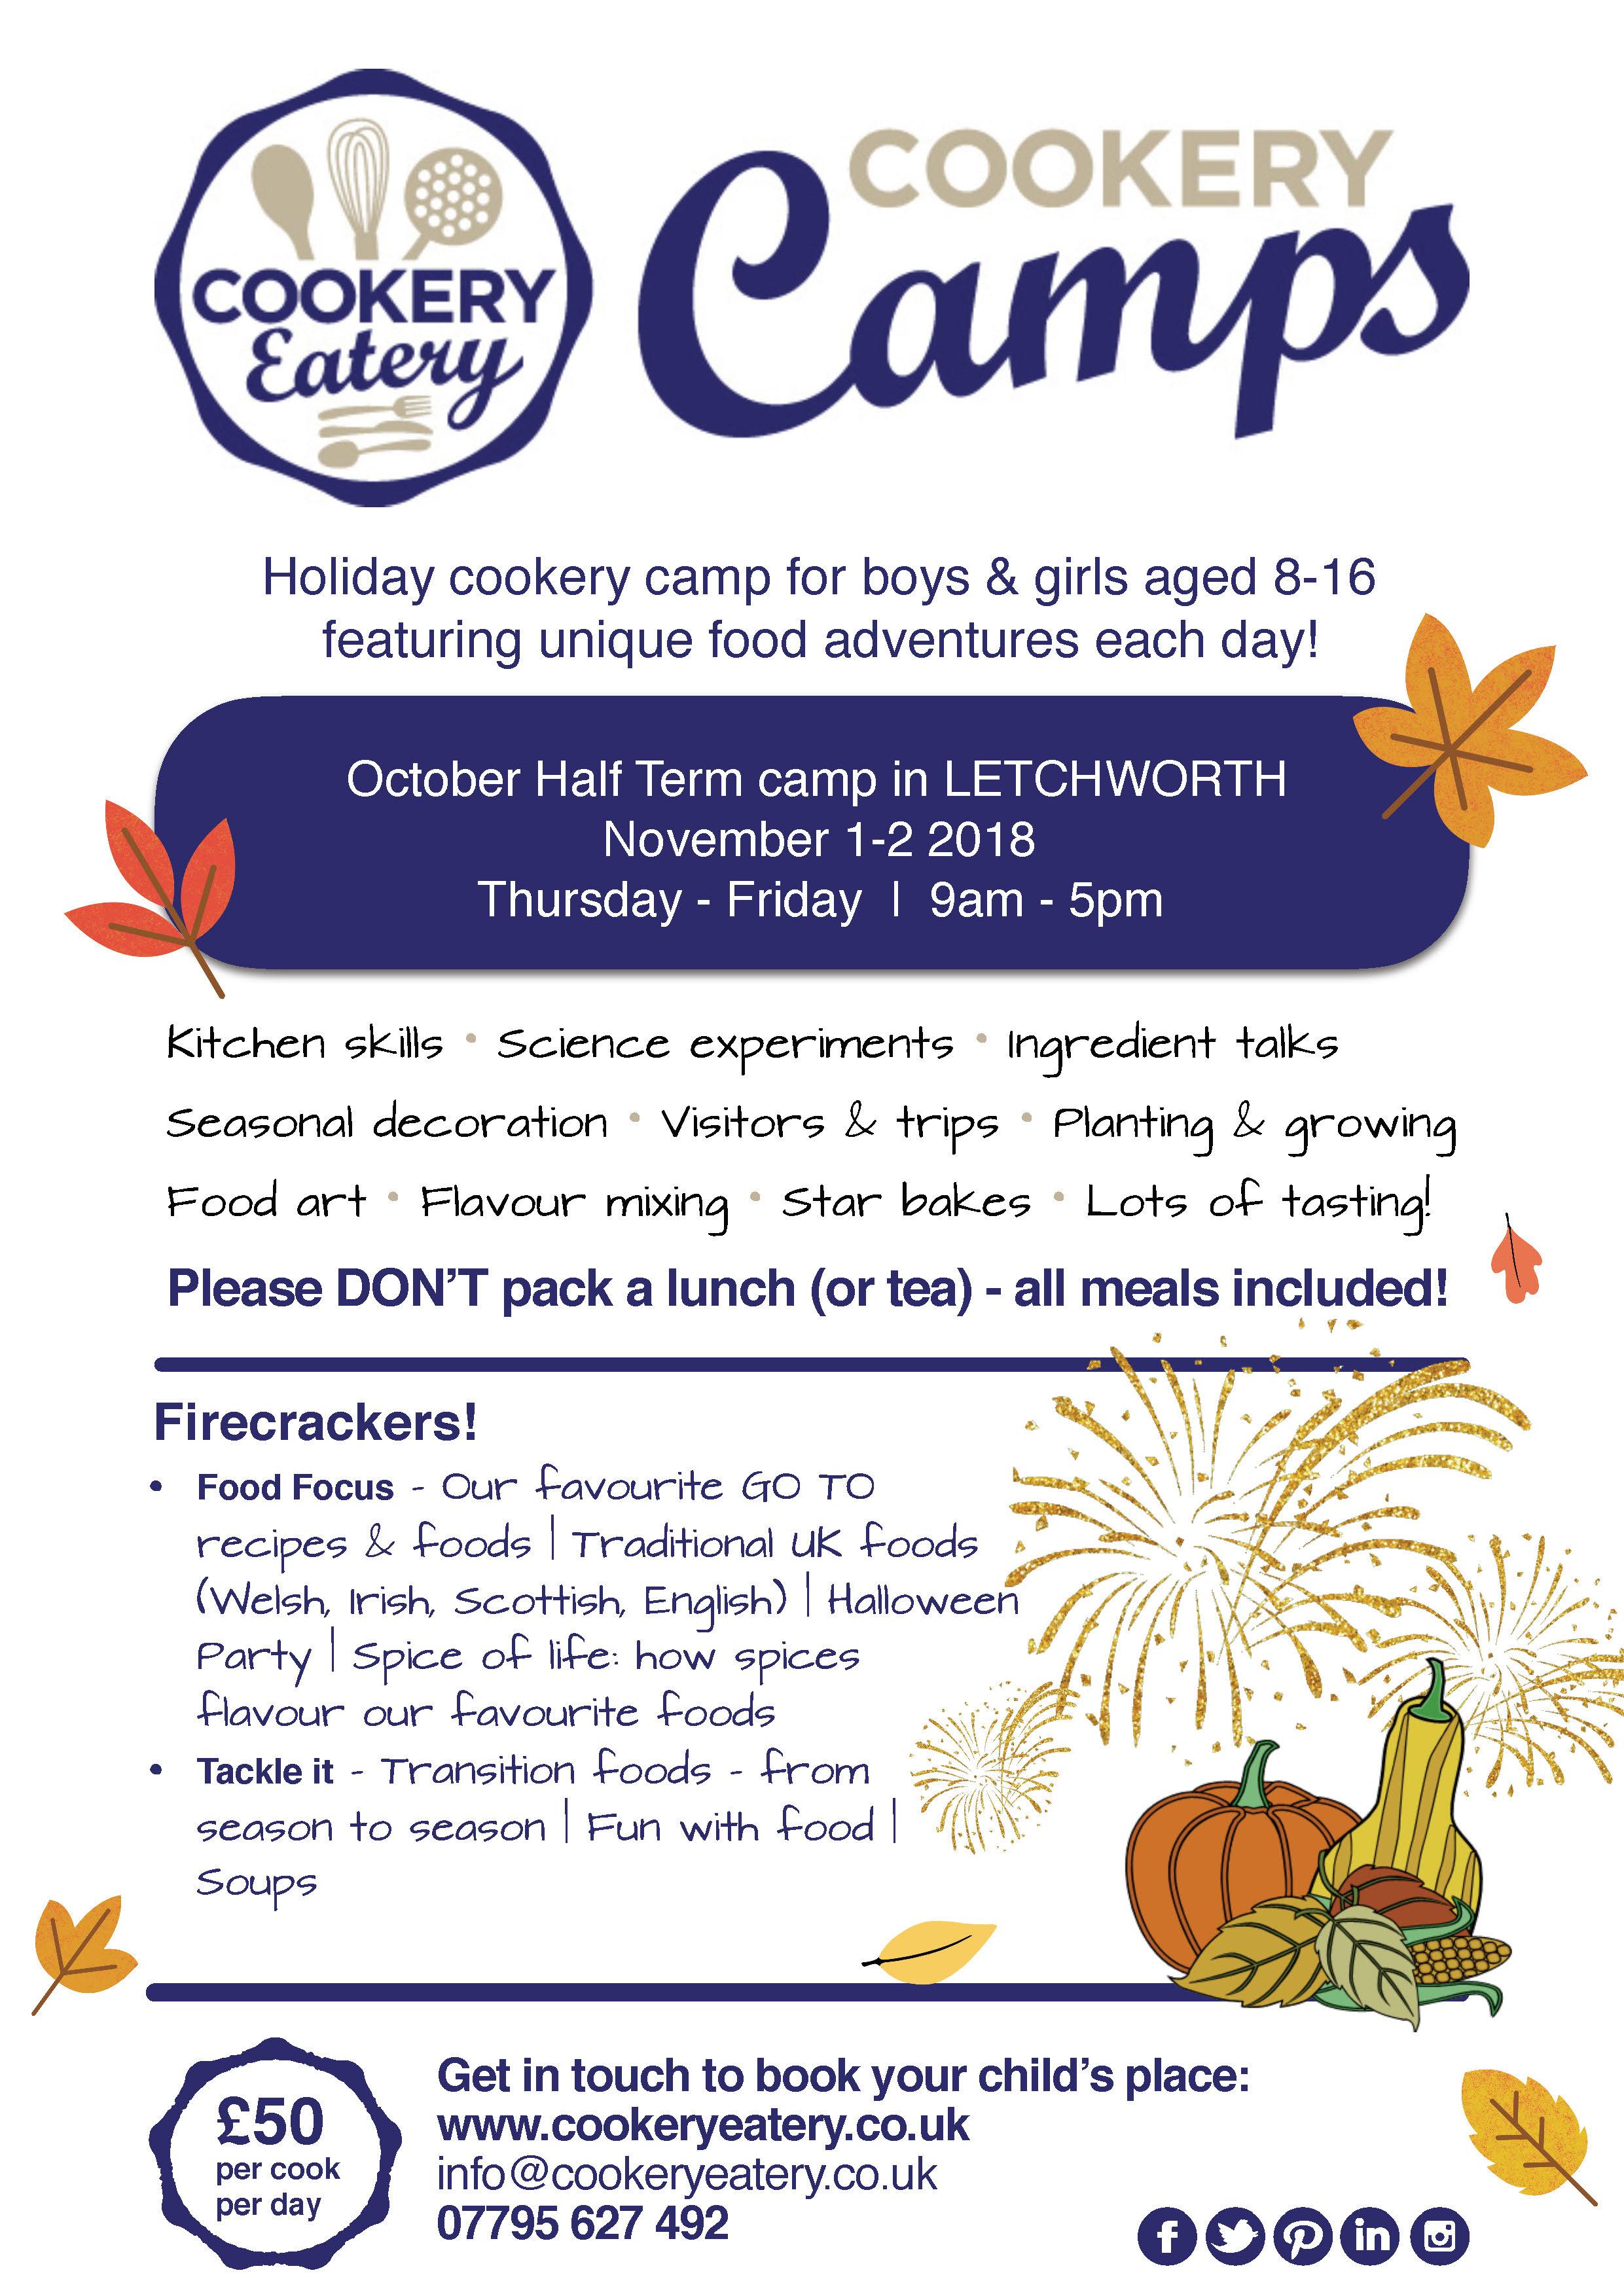 Letchworth - October Half Term 2018 Camp flyer.jpg